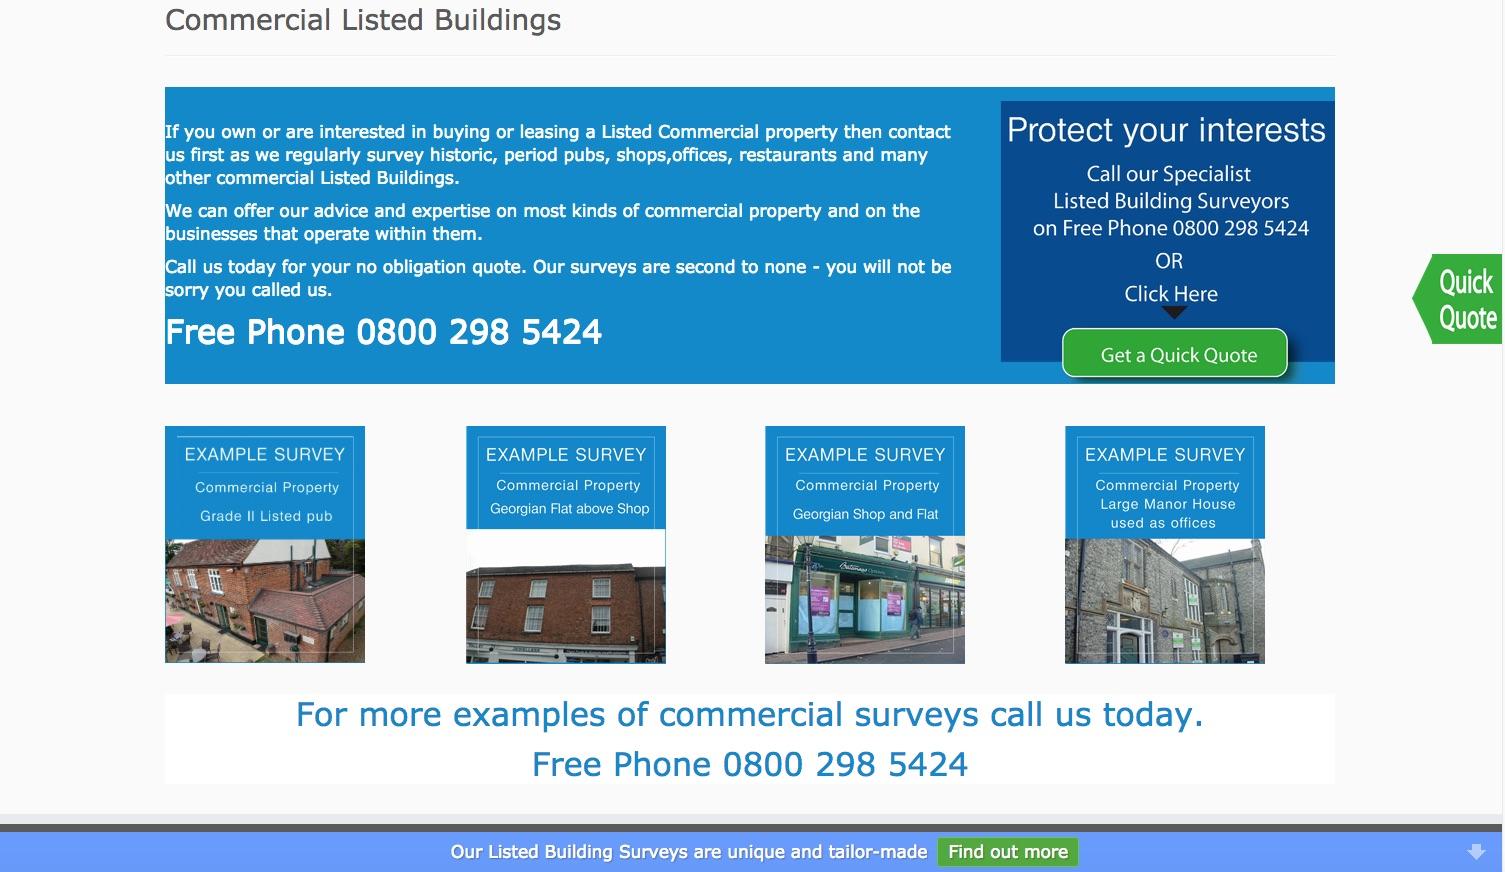 Britishlistedbuildingsurveys.com - Commercial Listed Buildings